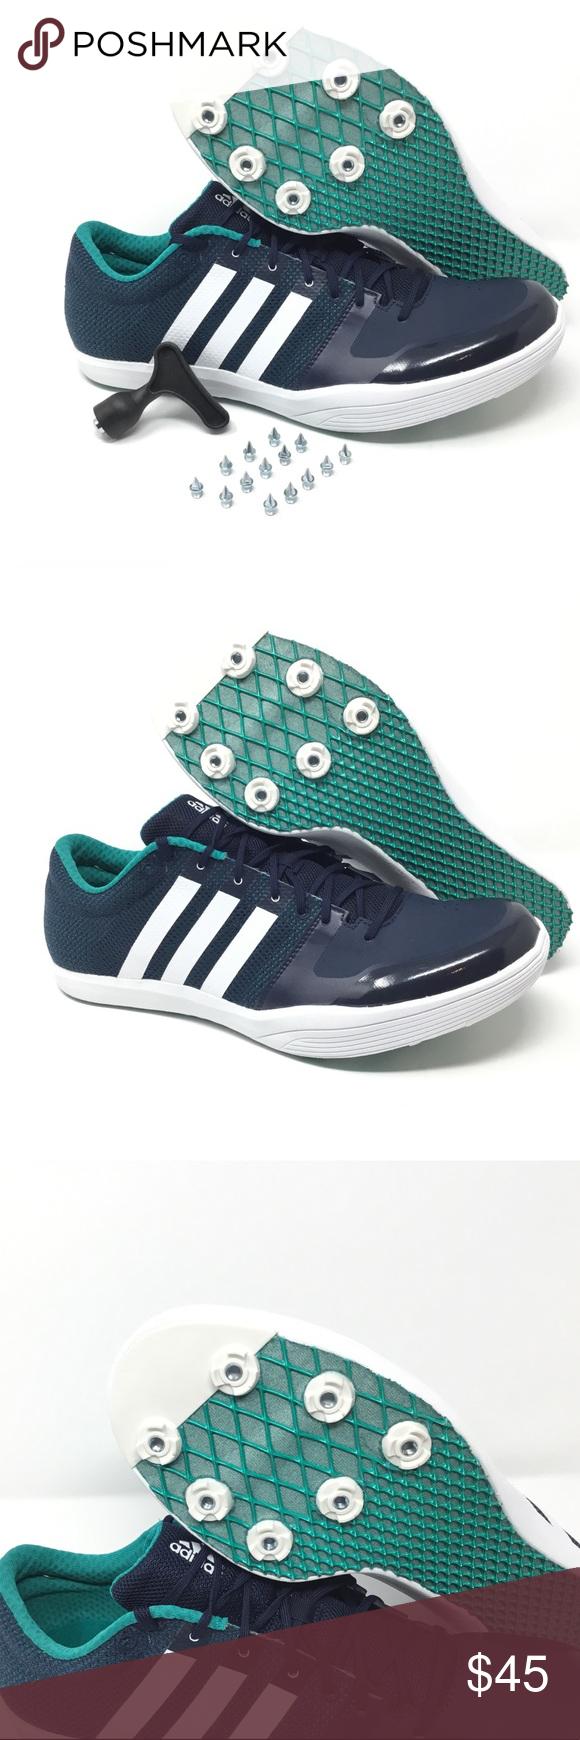 Adidas 2 Adizero LJ 2 Track & LJ Field Shoes Salto Adidas de longitud 6bfb41f - allergistofbrug.website